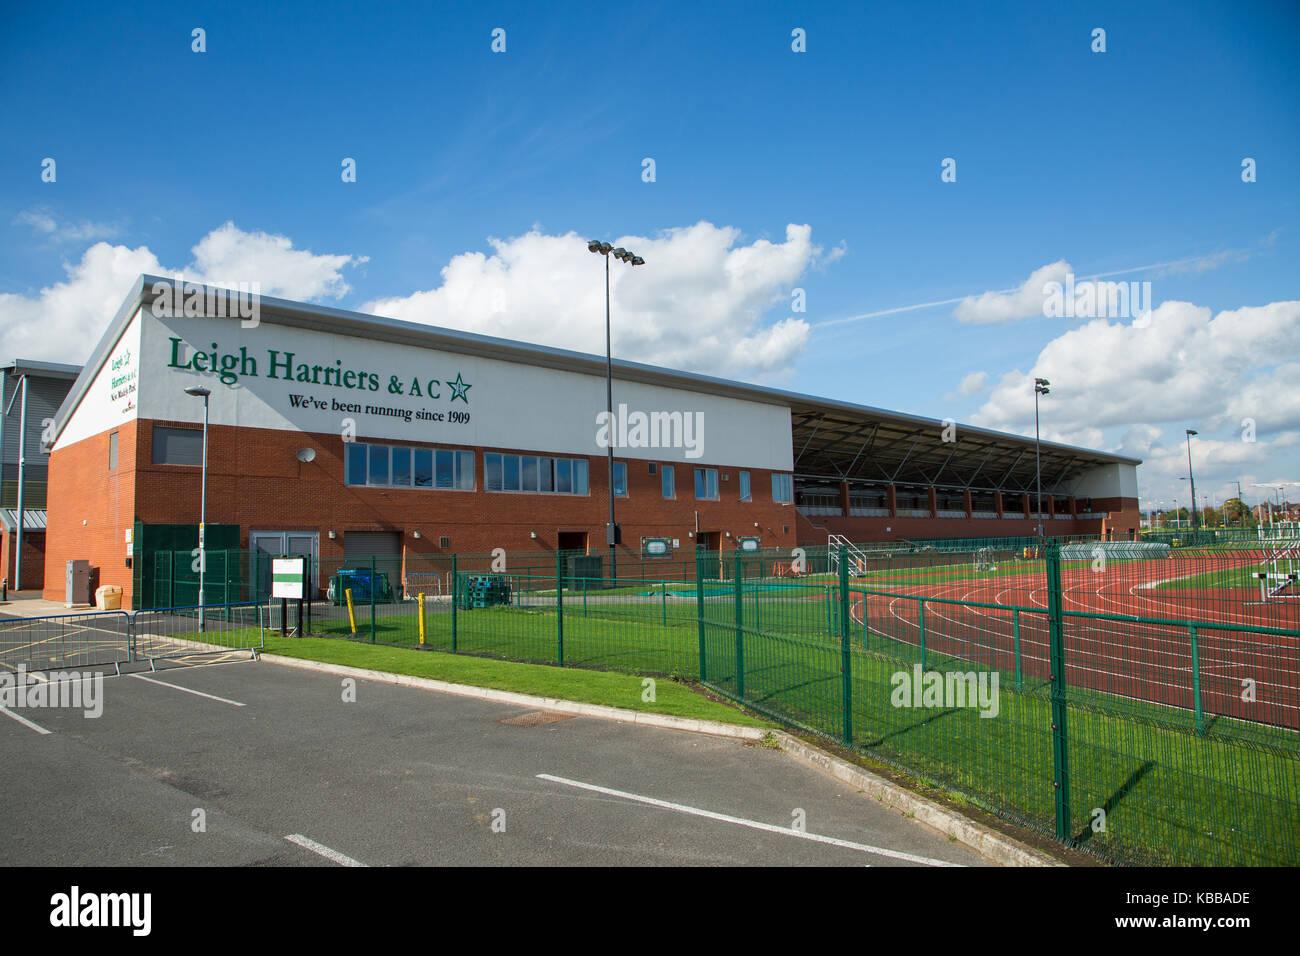 Leigh Harriers & AC running club & Stadium at Leigh sports village, Leigh, England, UK Stock Photo